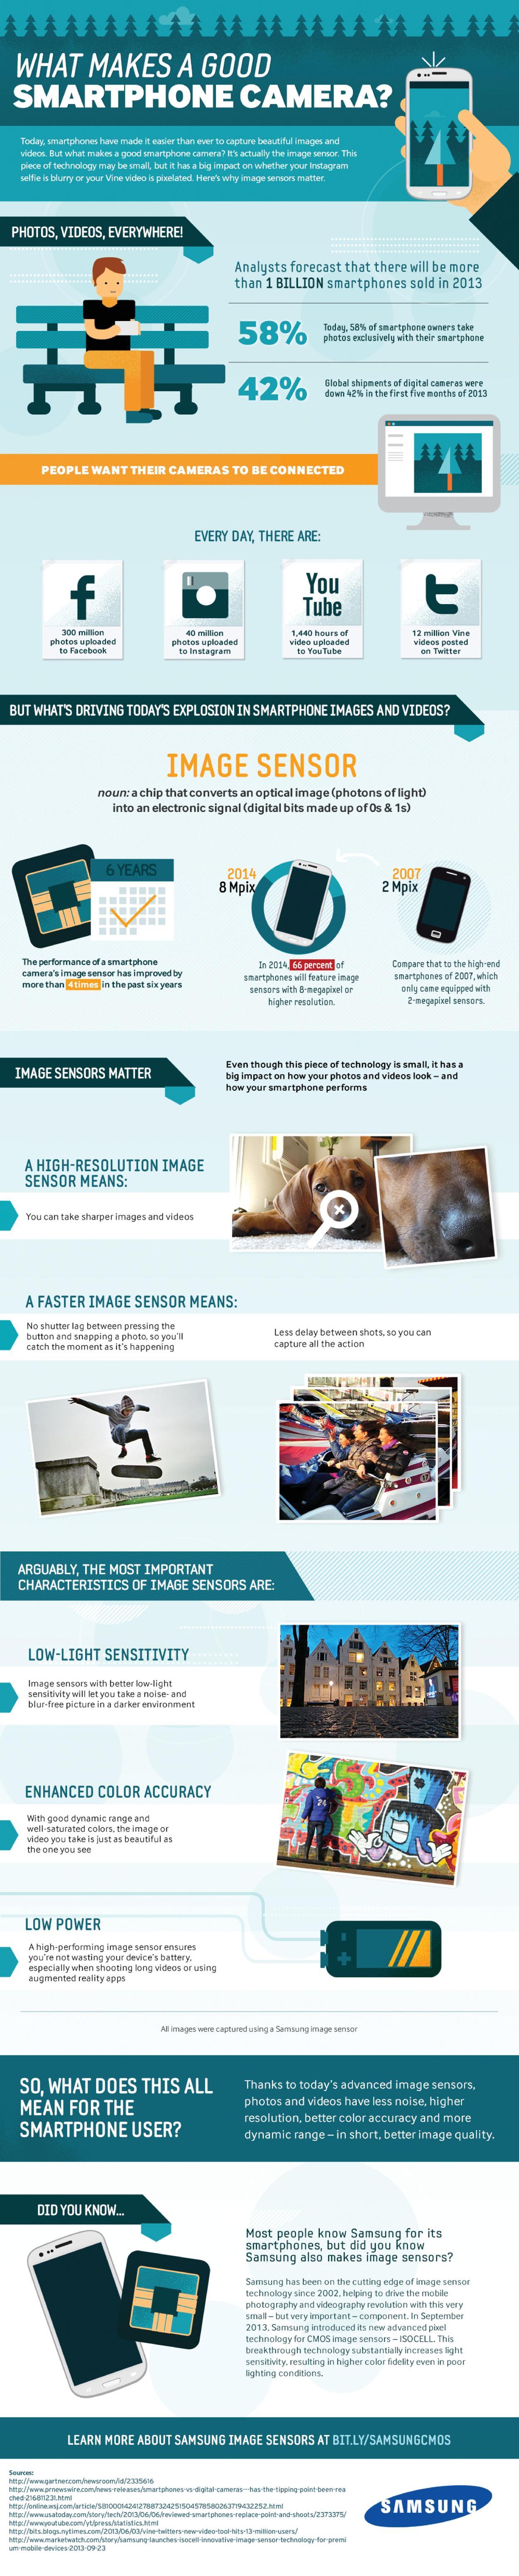 Samsung-tomorrow-infographic-on-smartphone-camera-image-sensors1